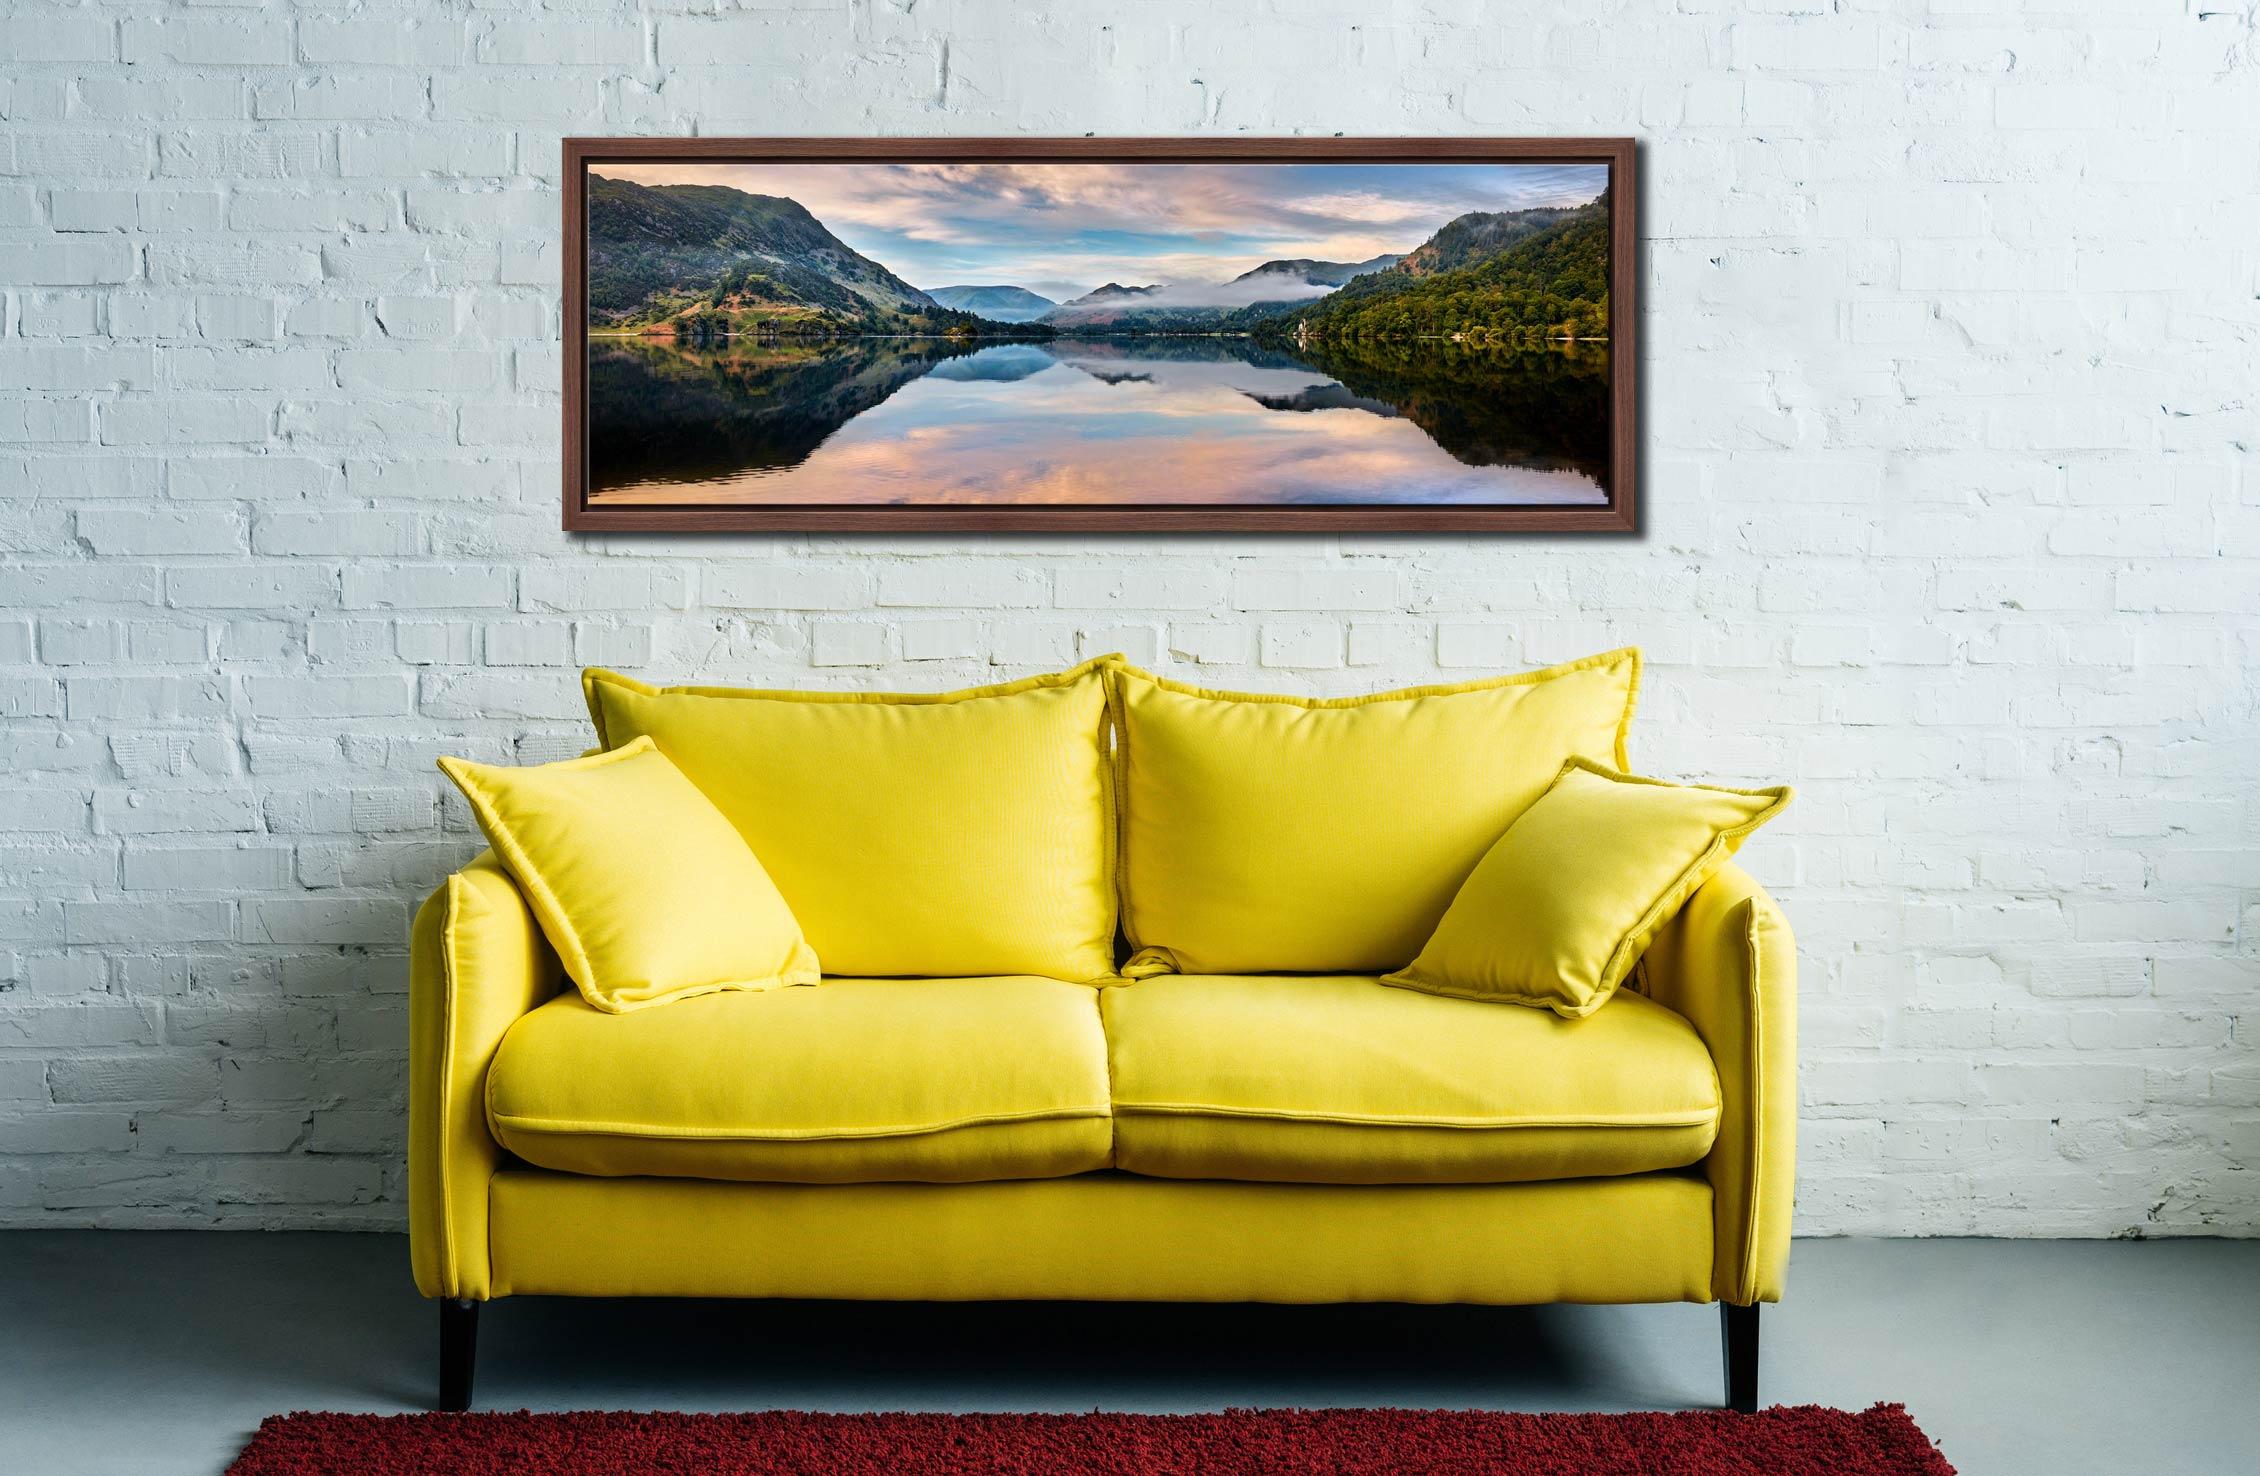 Ullswater Calmness - Walnut floater frame with acrylic glazing on Wall